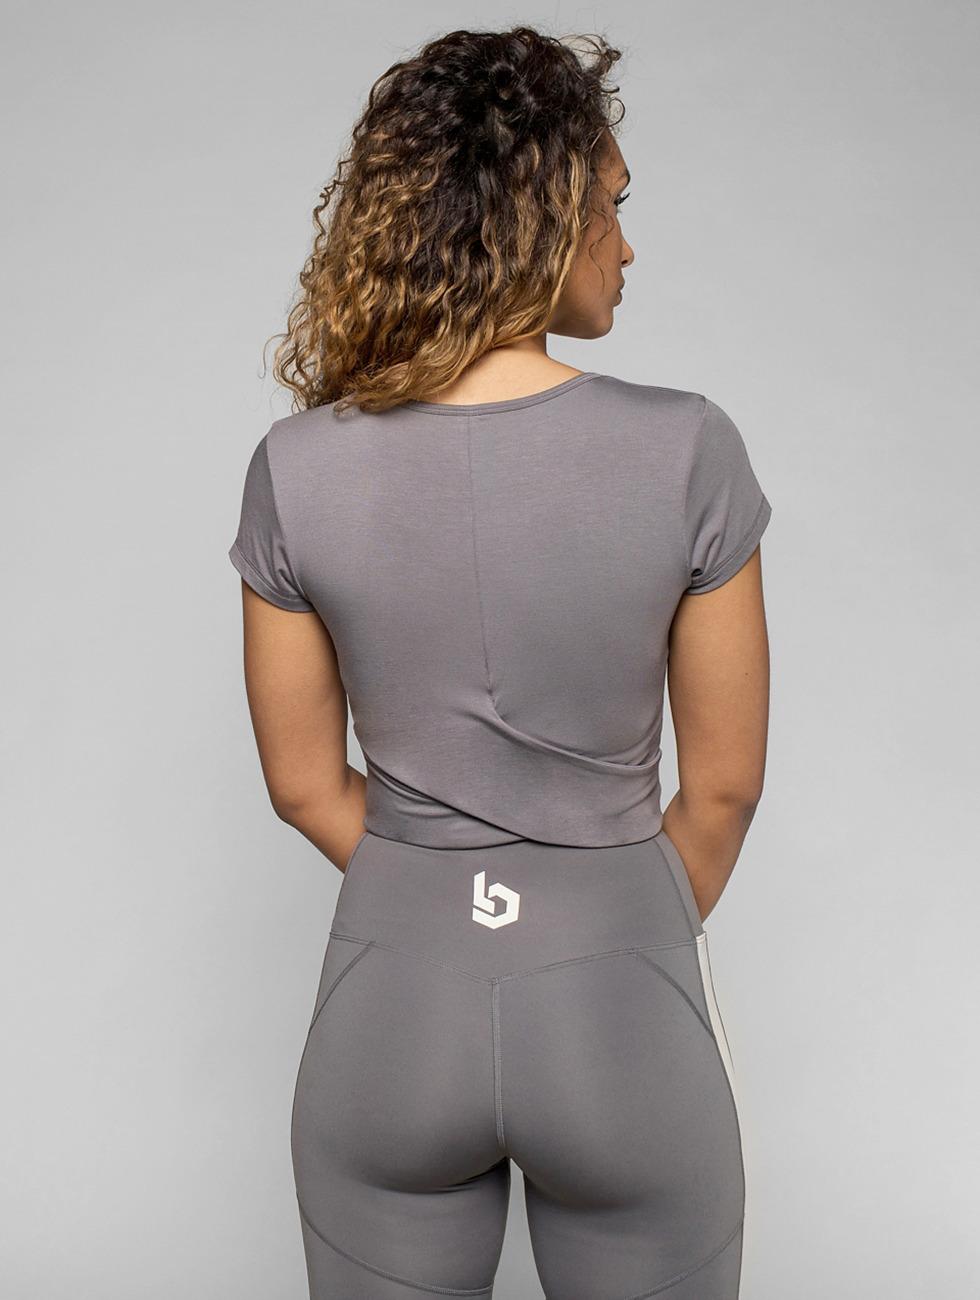 Beyond Limits Camiseta Bonded gris